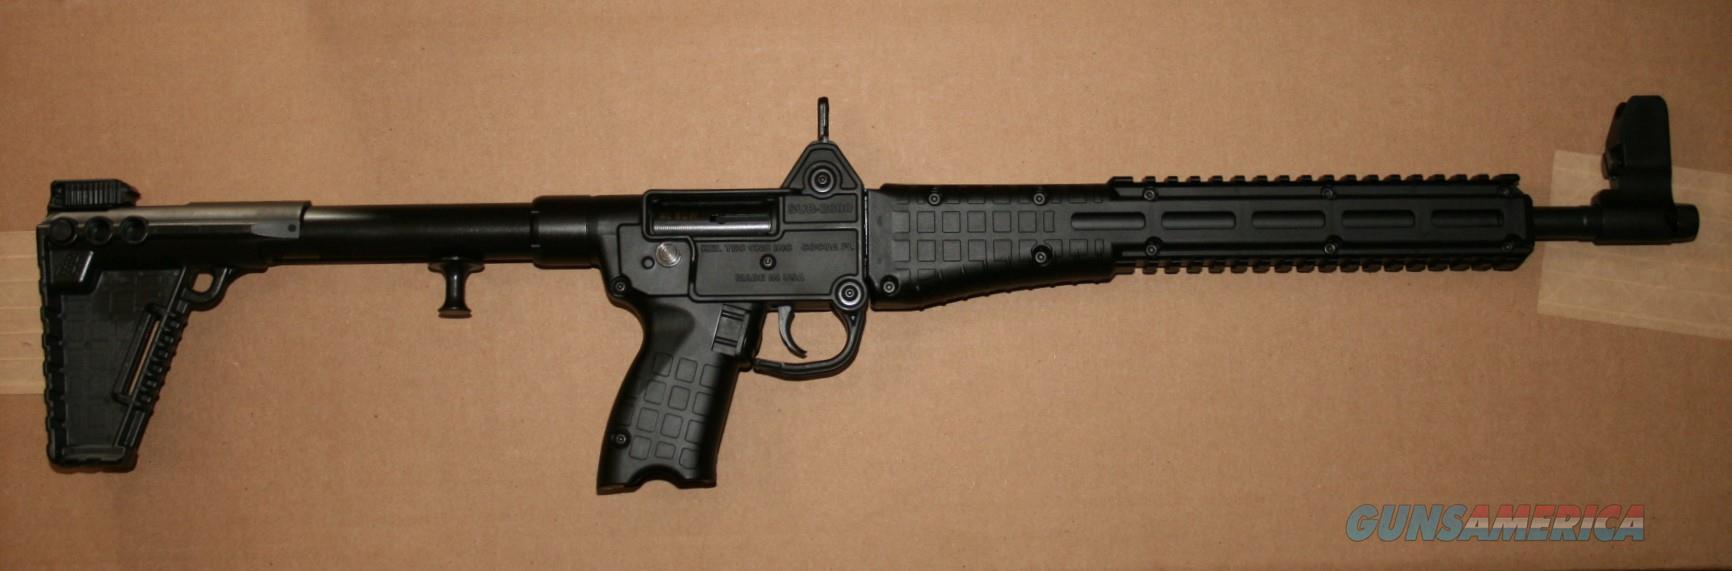 "Kel-Tec SUB2000 Gen 2  40 S&W 16.25"" 10 Rd Glock 22 Magazine   Guns > Rifles > Kel-Tec Rifles"